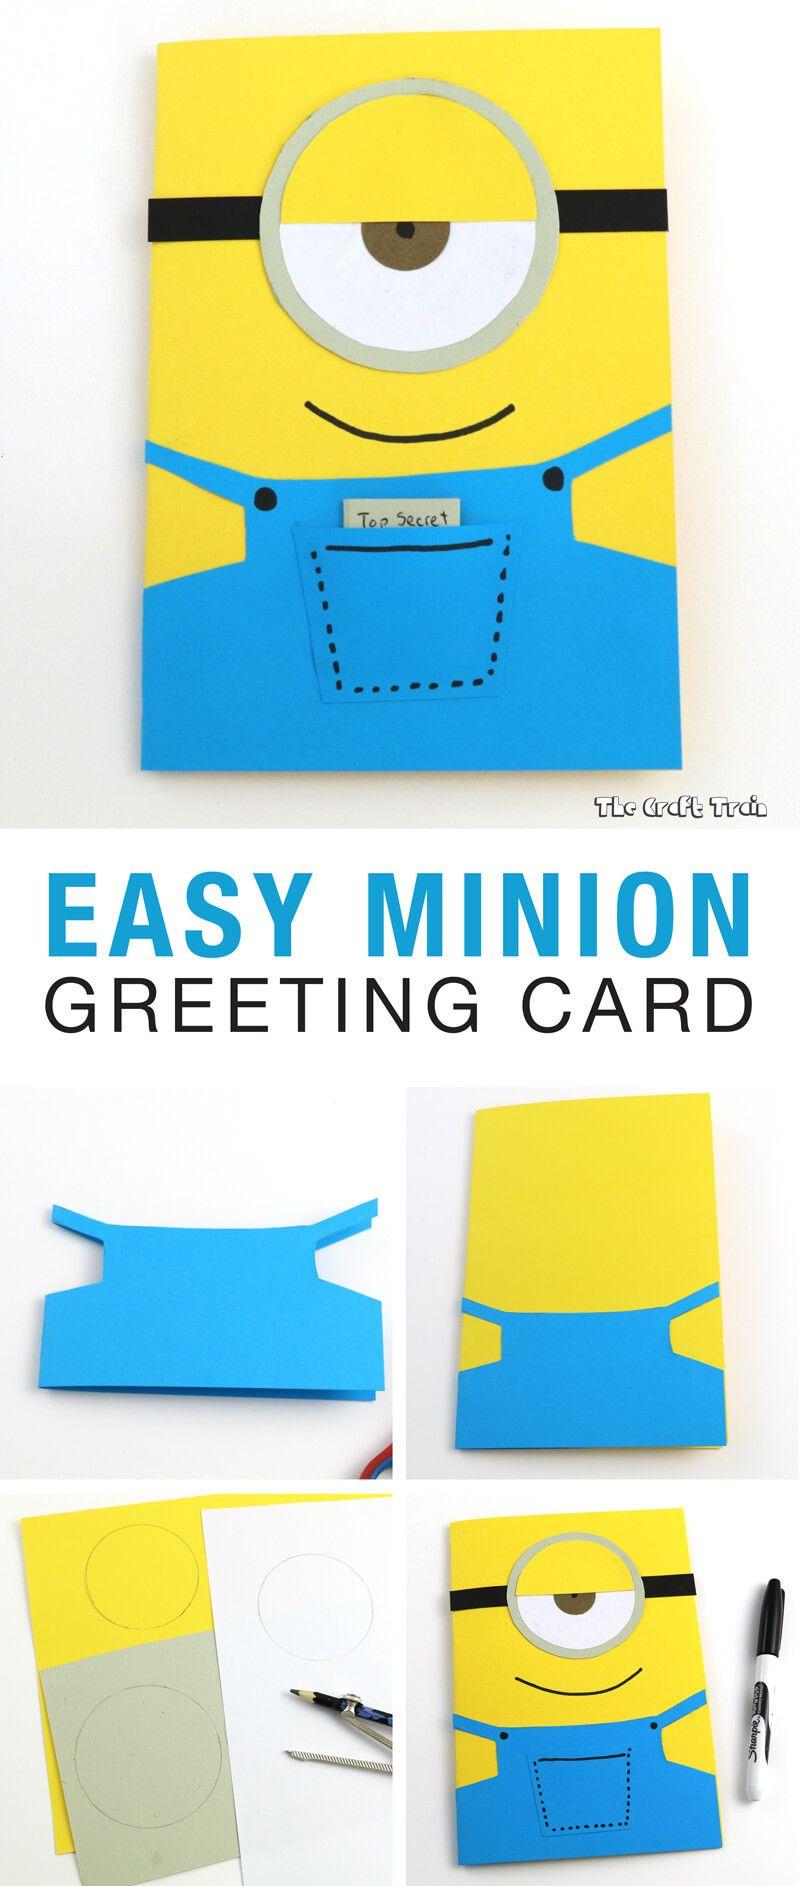 Easy Minion Greeting Card Happy Birthday Cards Diy Dad Birthday Card Minion Card